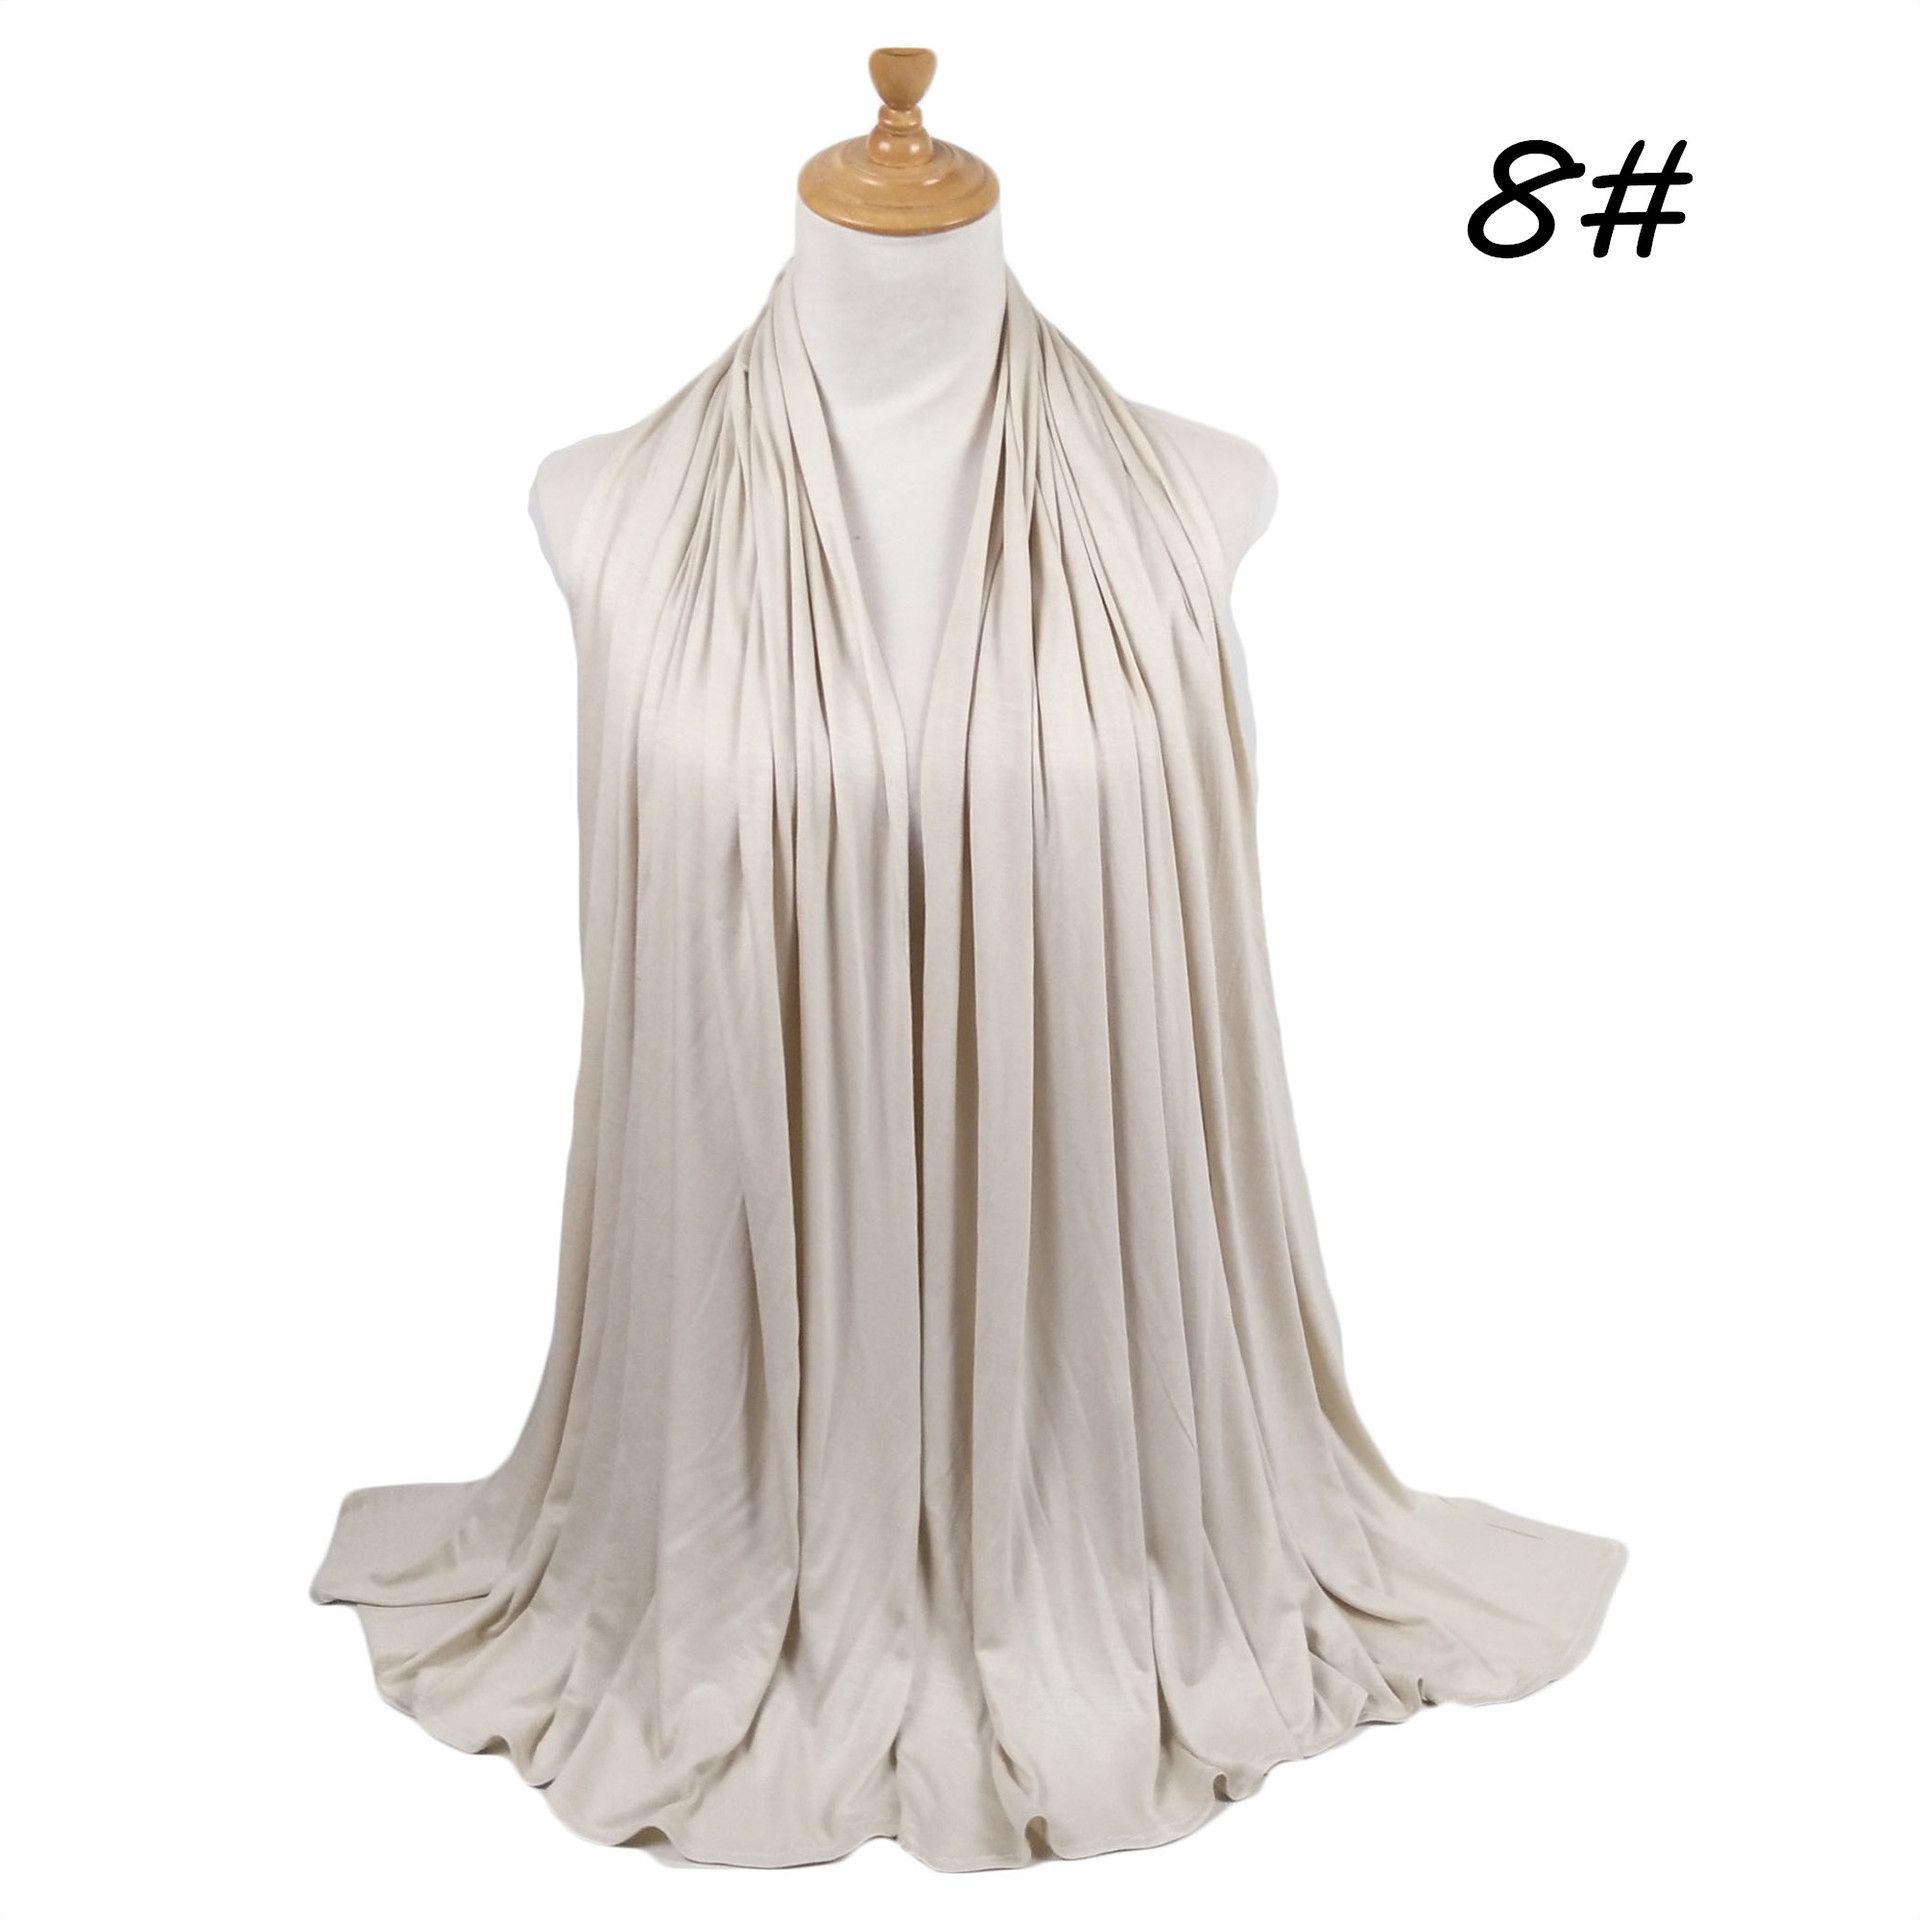 2020 Cotton Knit Jersey Hijab Abaya Scarf Turban Muslim Hijabs Foulard Femme Turbans For Women Headscarf Turbante Musulman